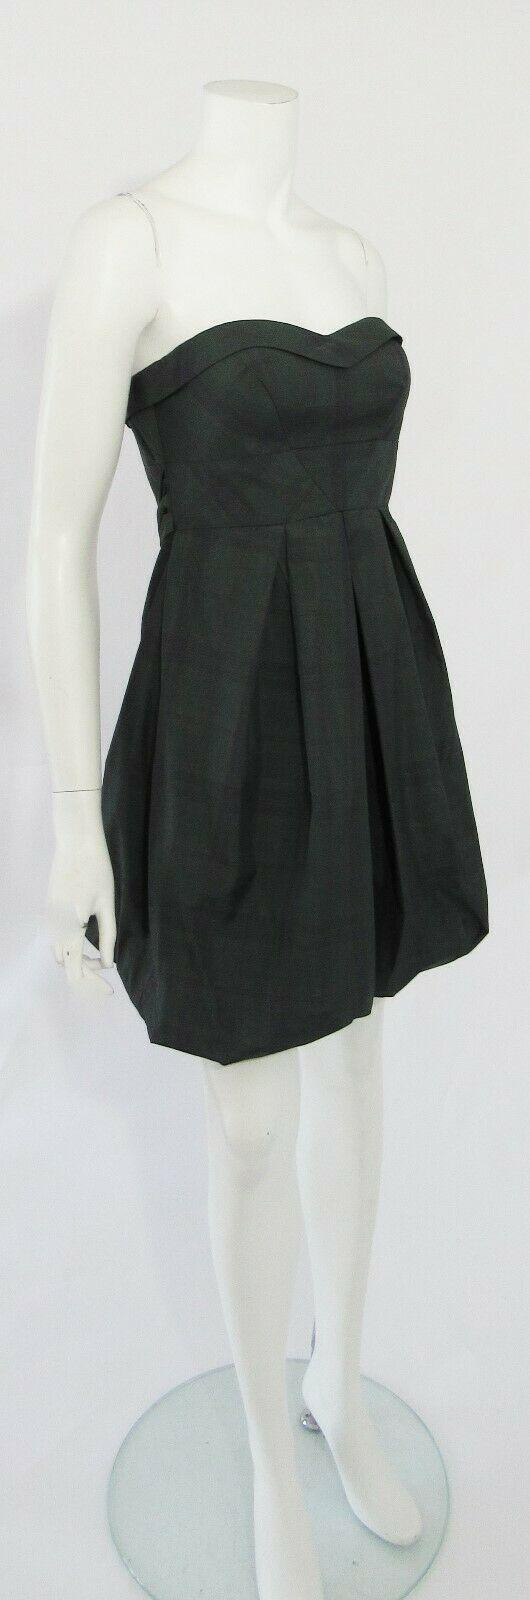 Jessica Simpson Green Plaid Bustier Removable Strap Party Mini Dress Sz 6 NWT